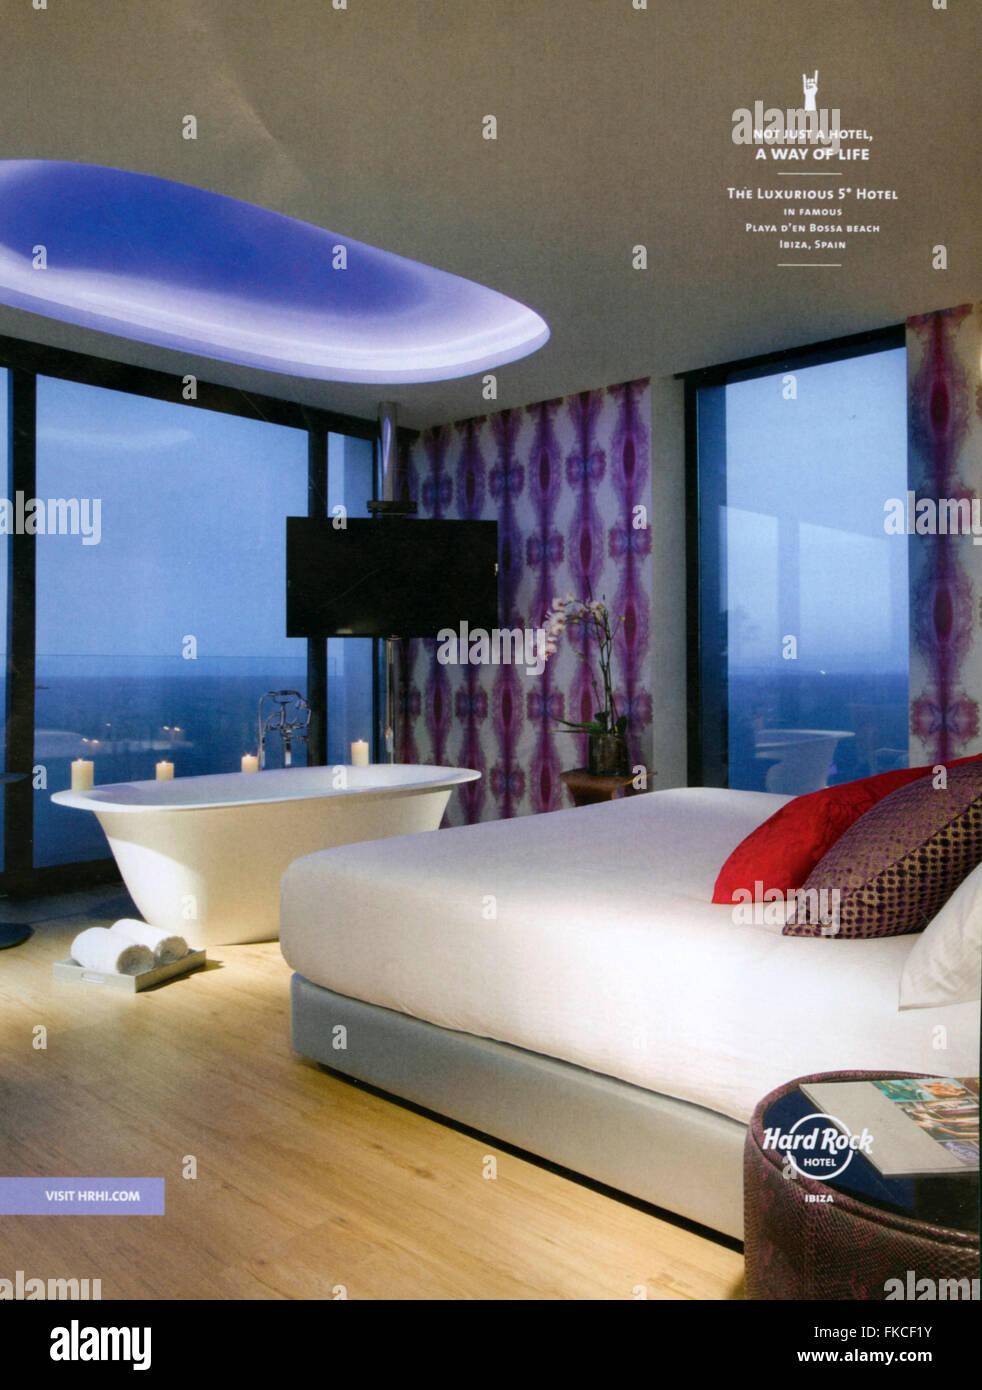 2010s UK Hard Rock Hotel Magazine Advert Stock Photo: 98005543 - Alamy